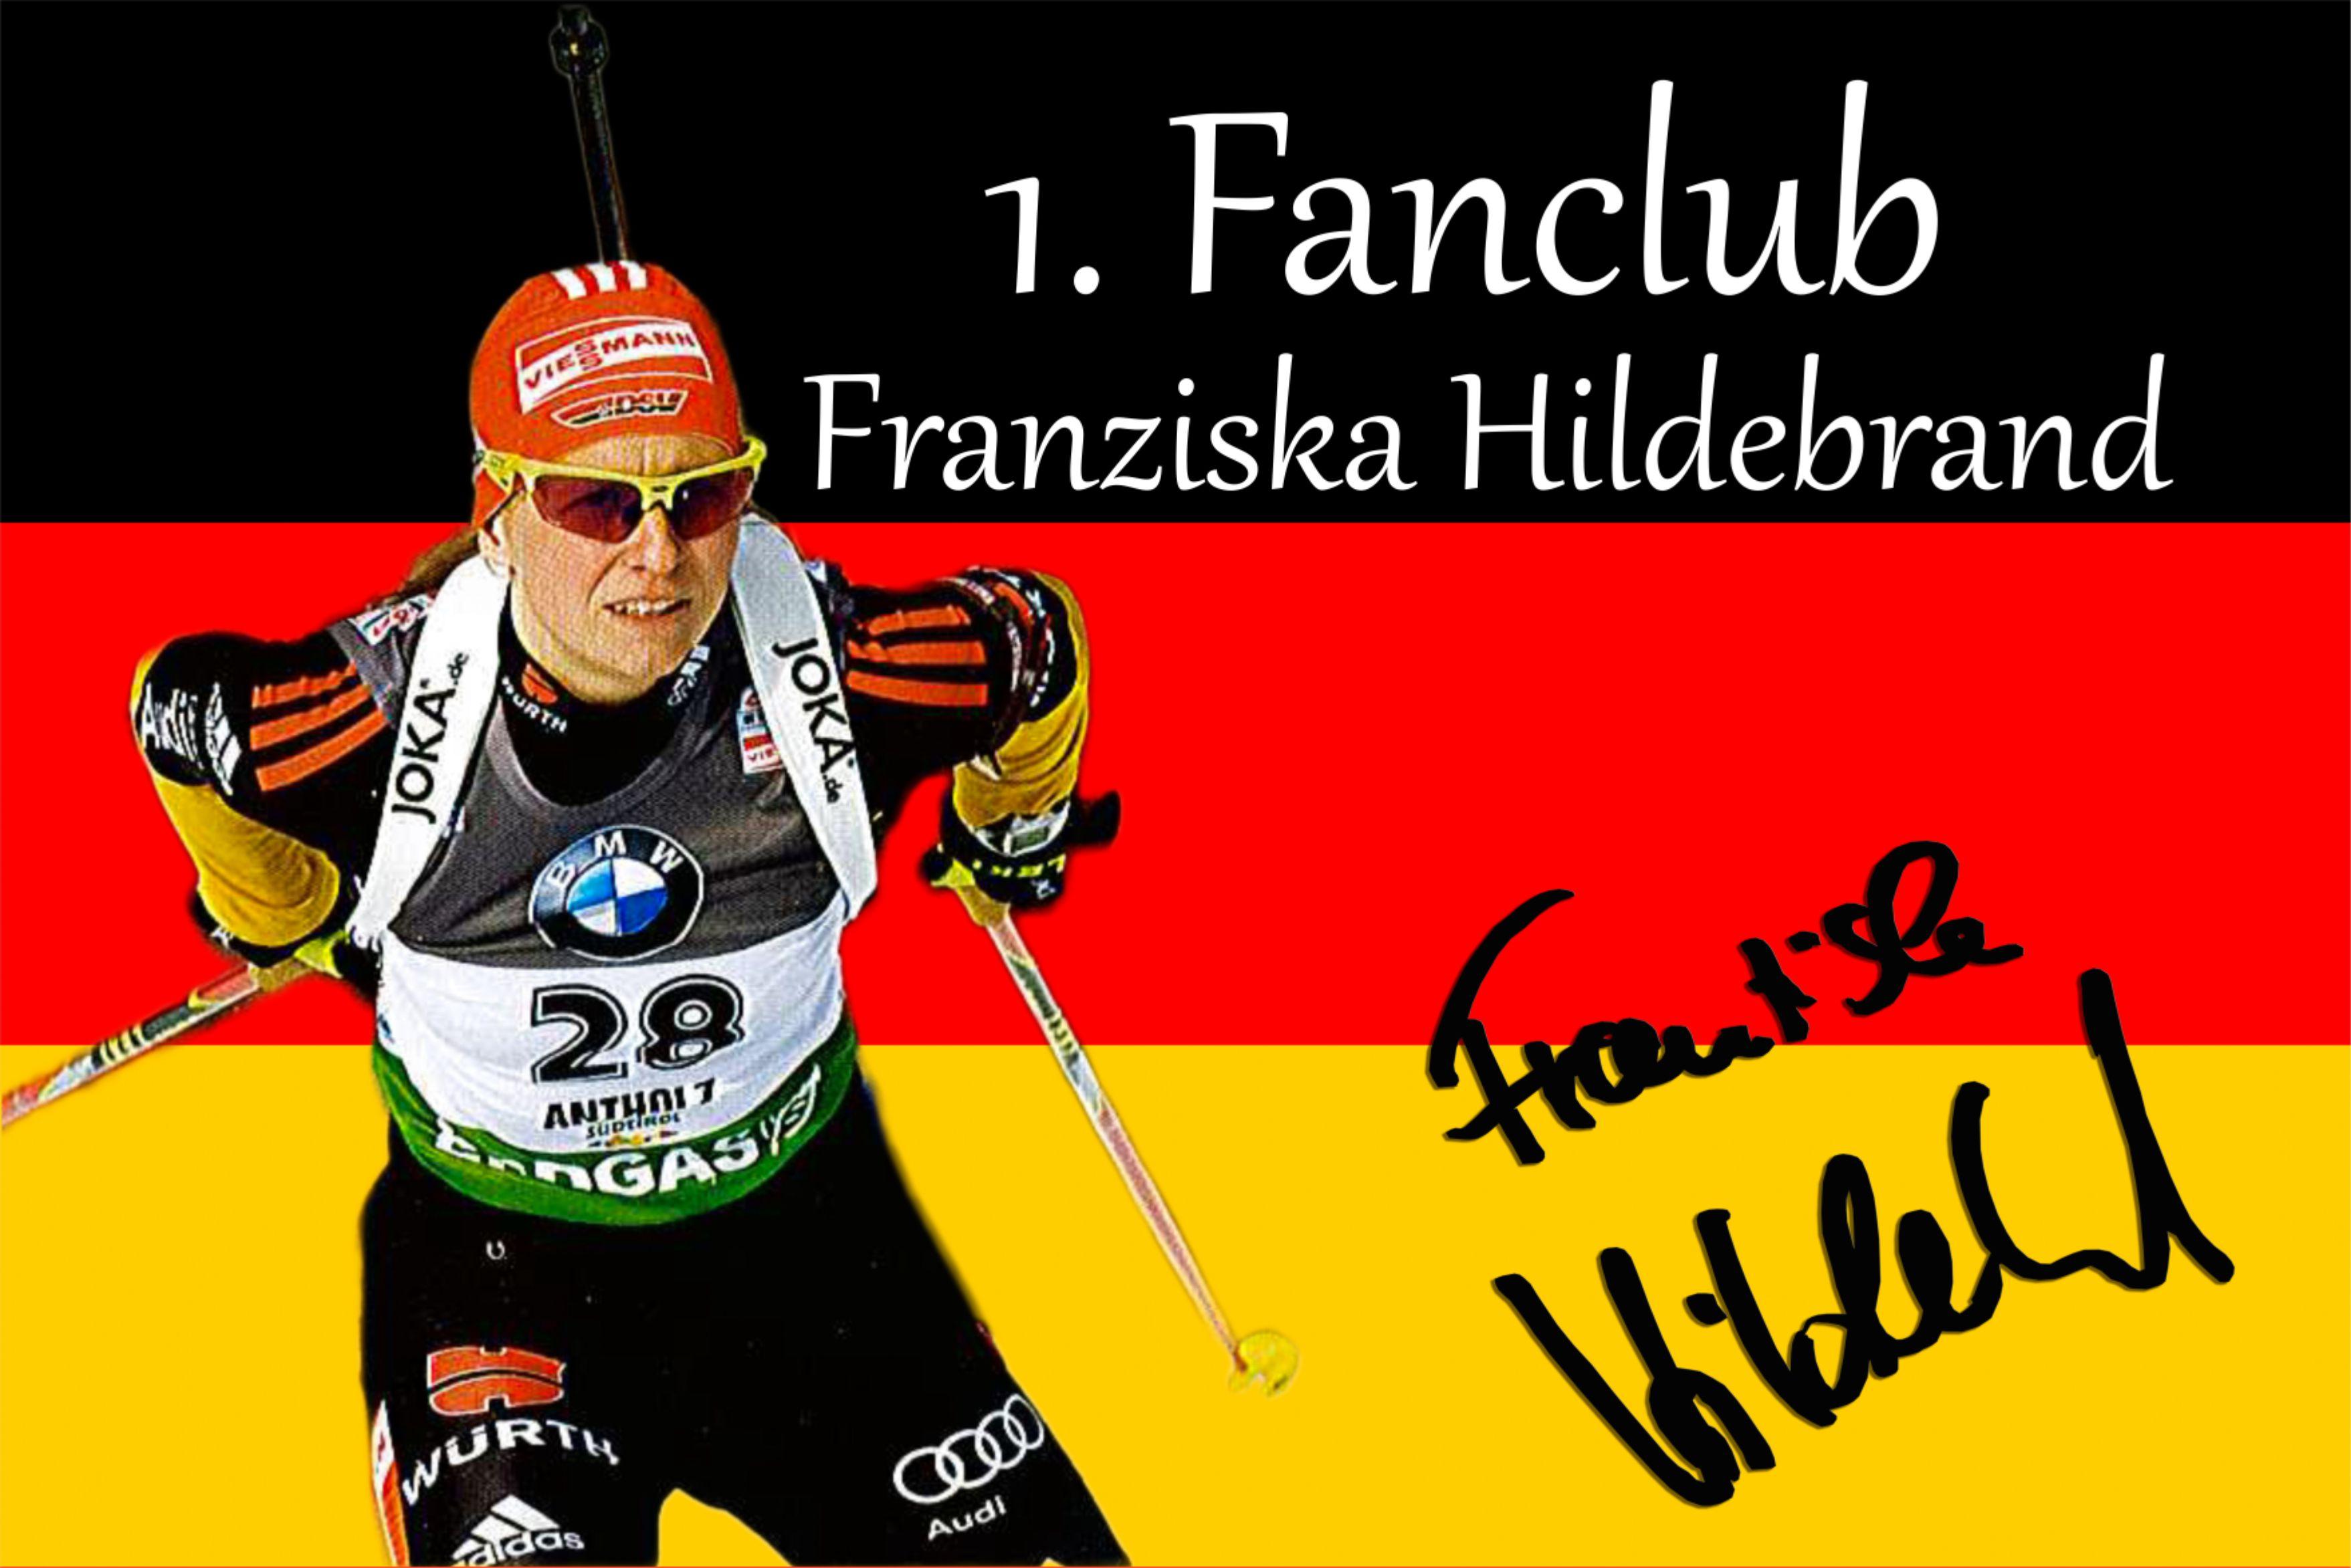 Fanclubfahne